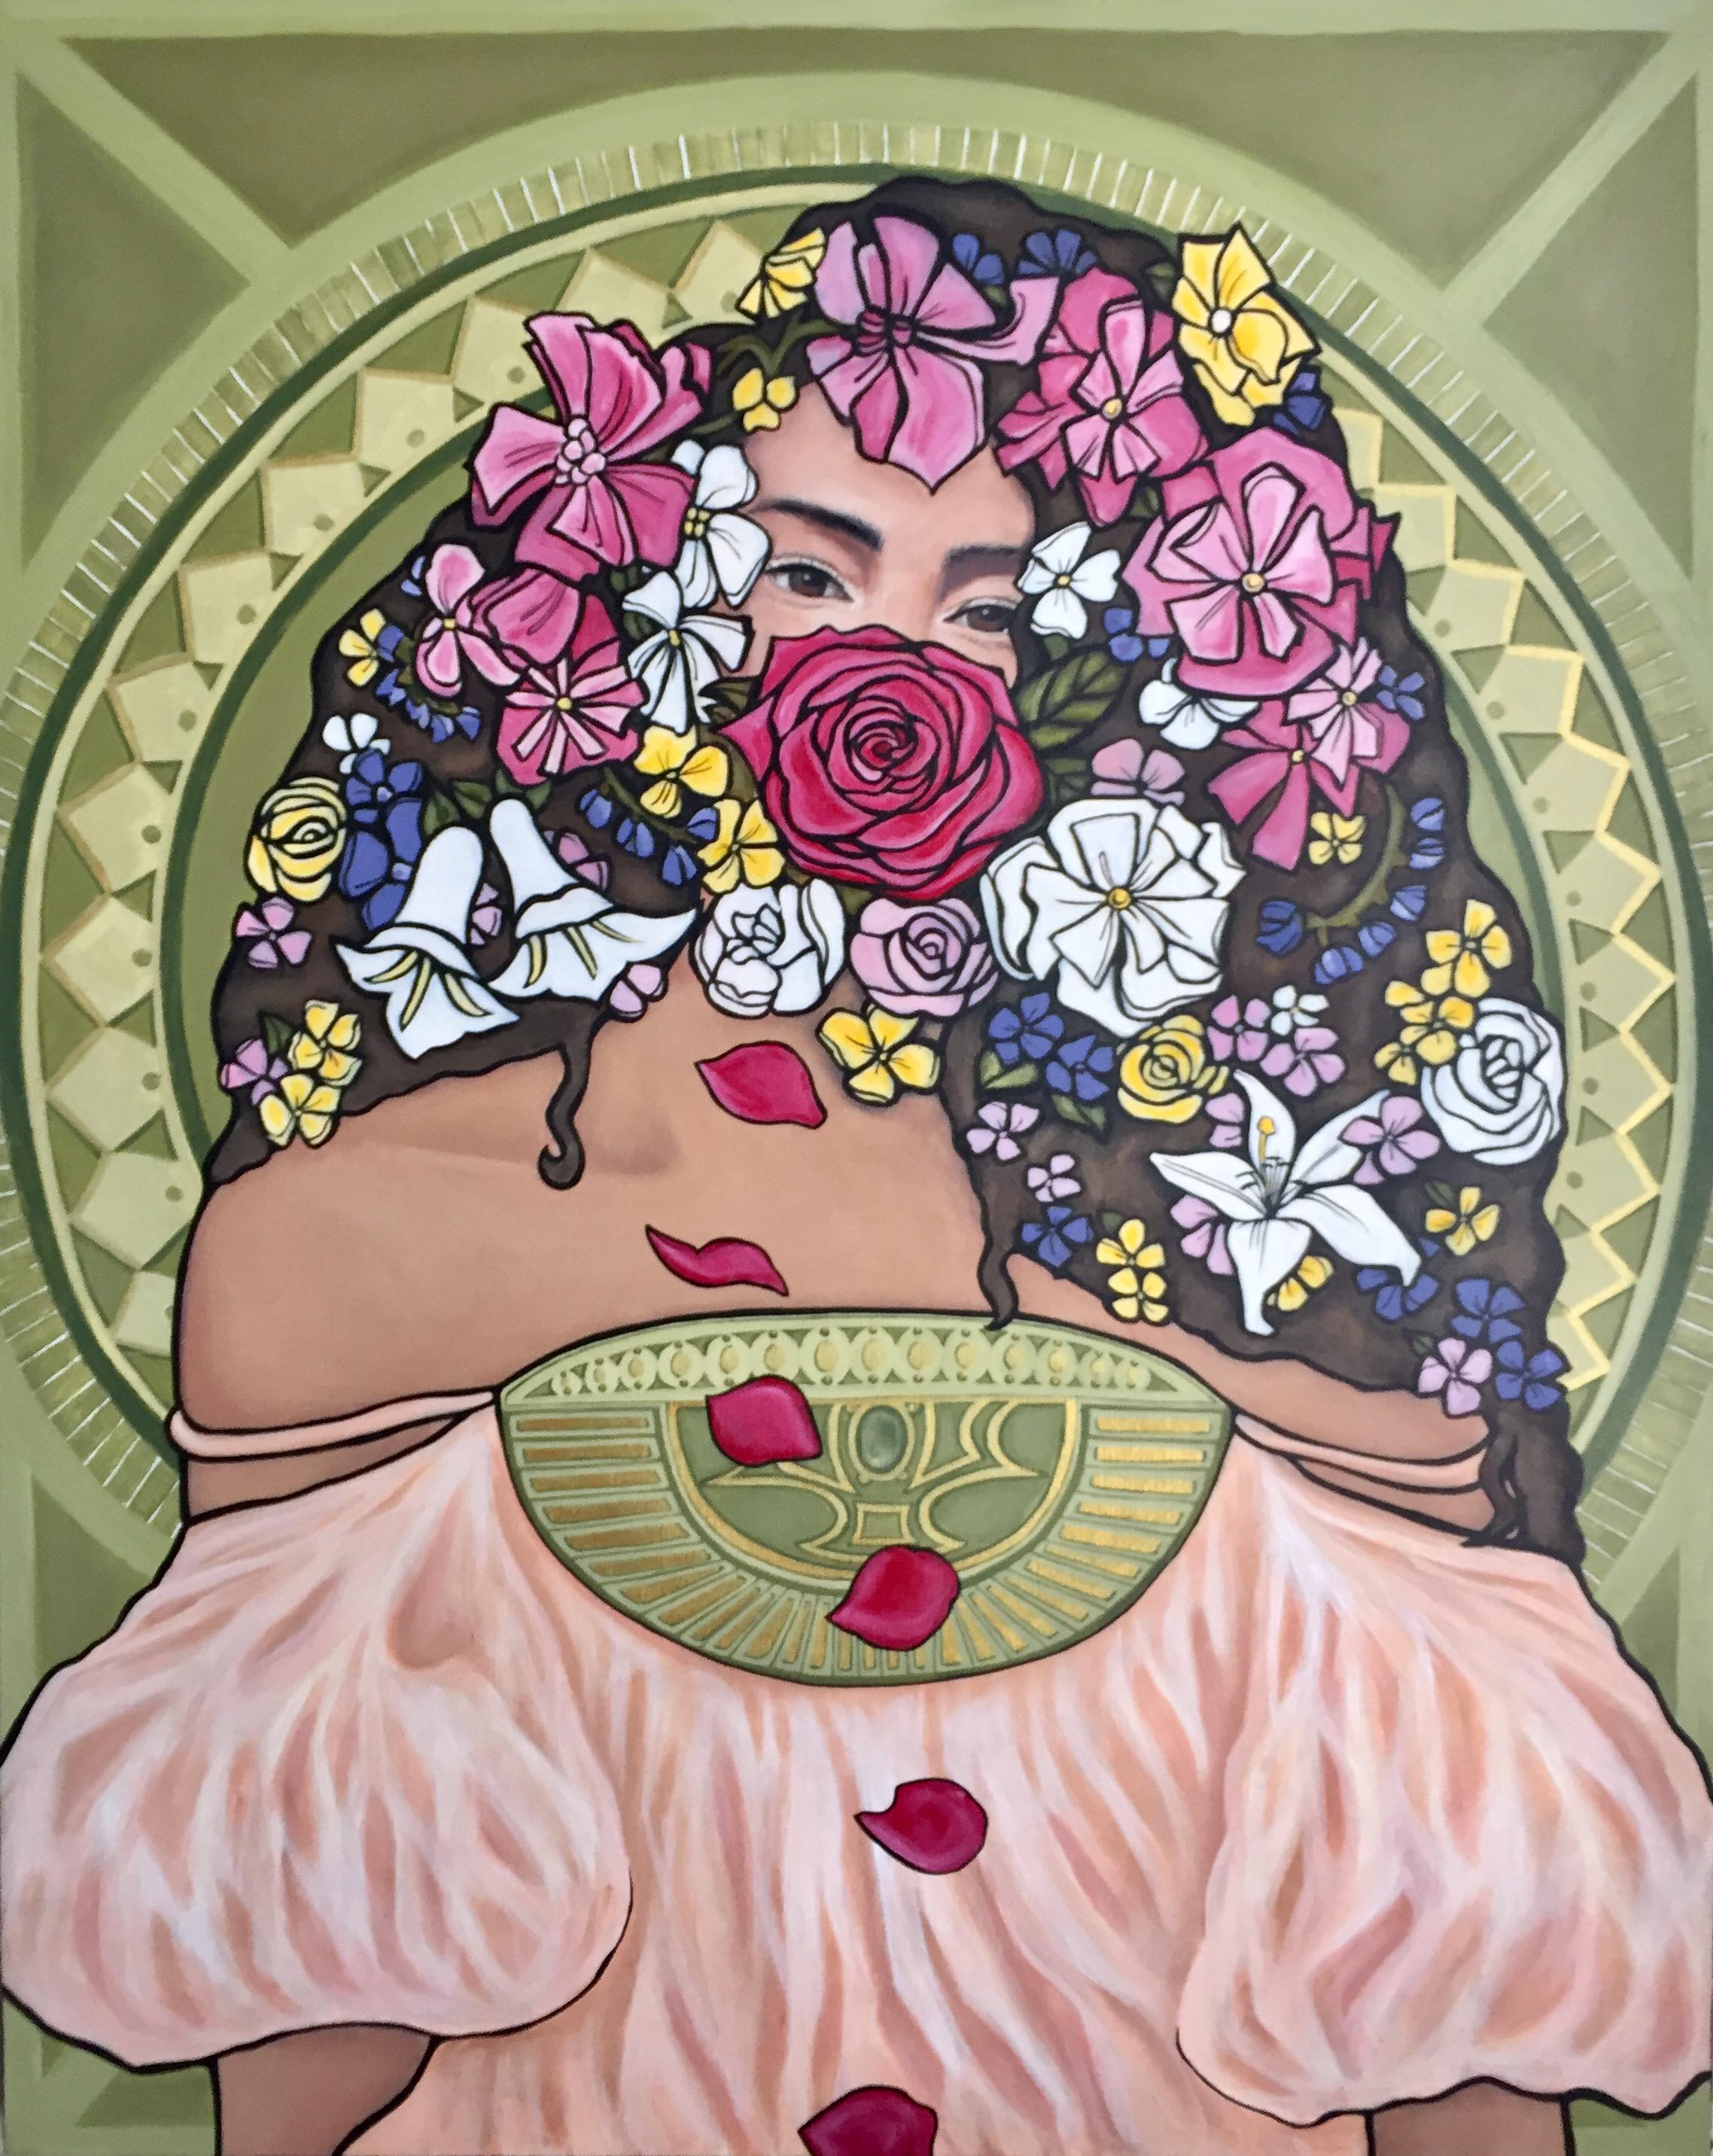 My Daydream   2017. Acrylic on canvas. 24 x 30.  $600 -  SOLD